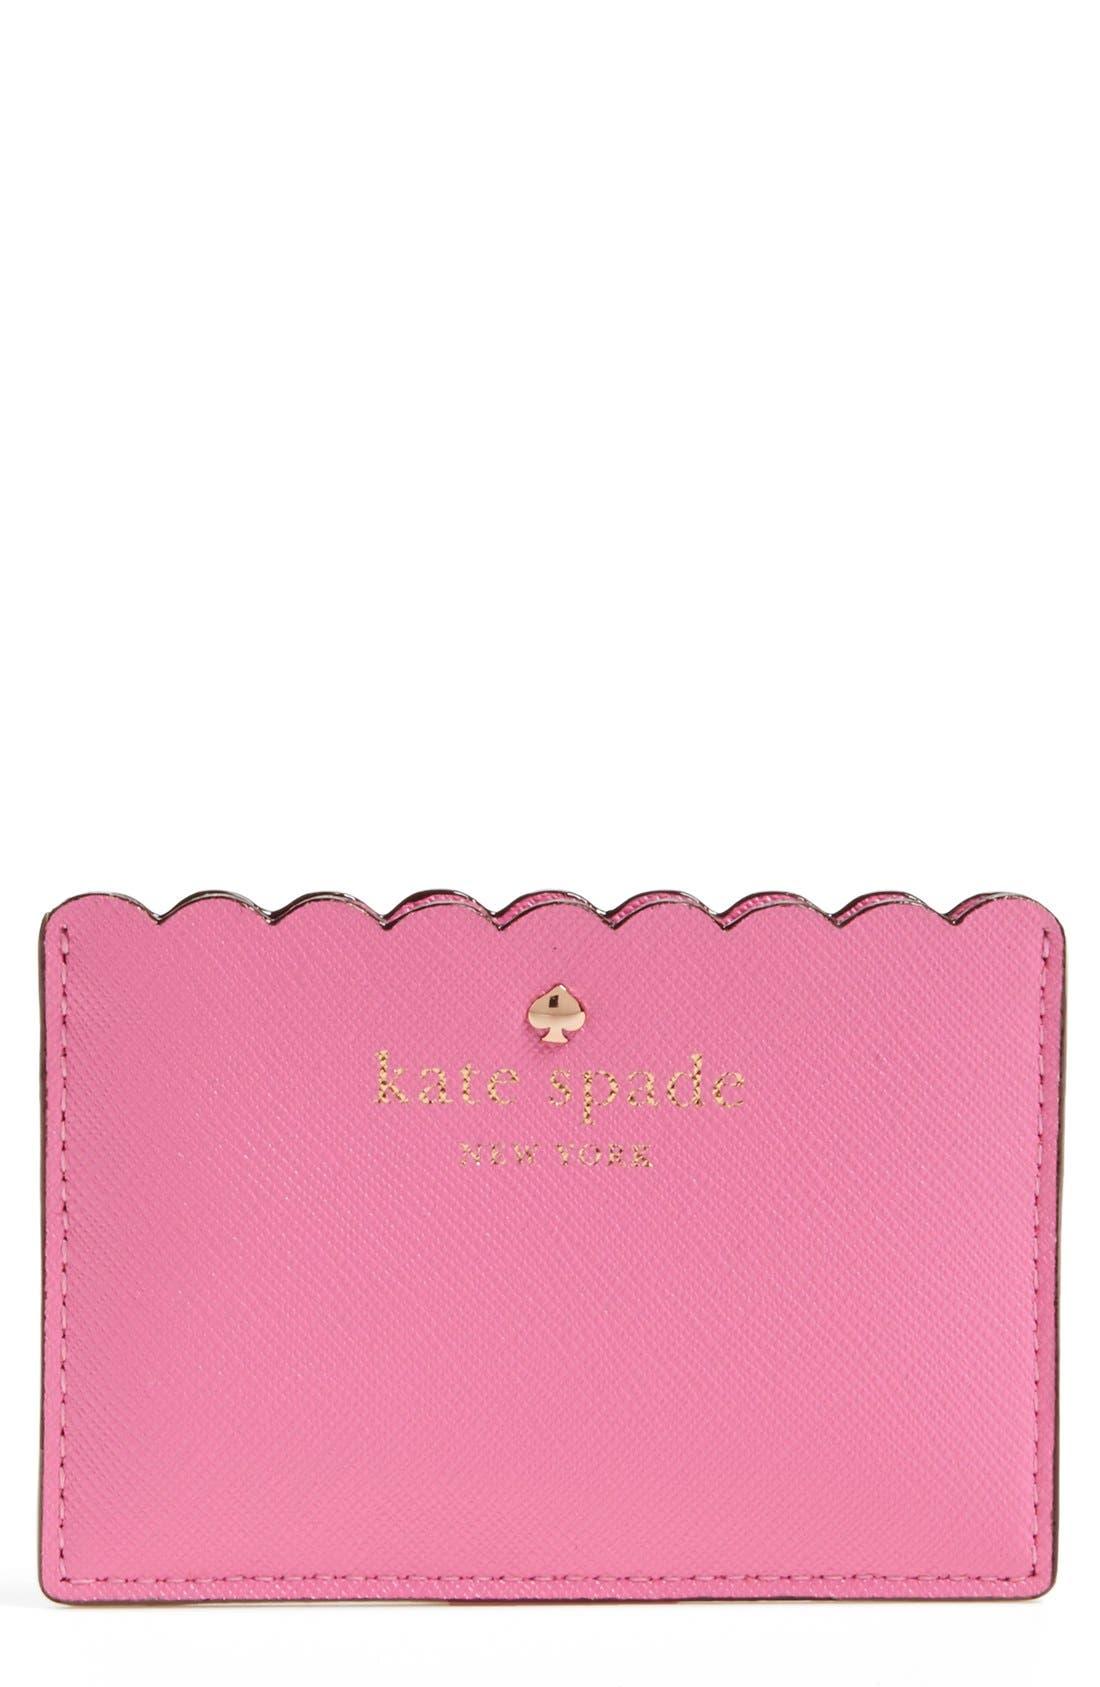 Main Image - kate spade new york 'cape drive' saffiano leather card holder